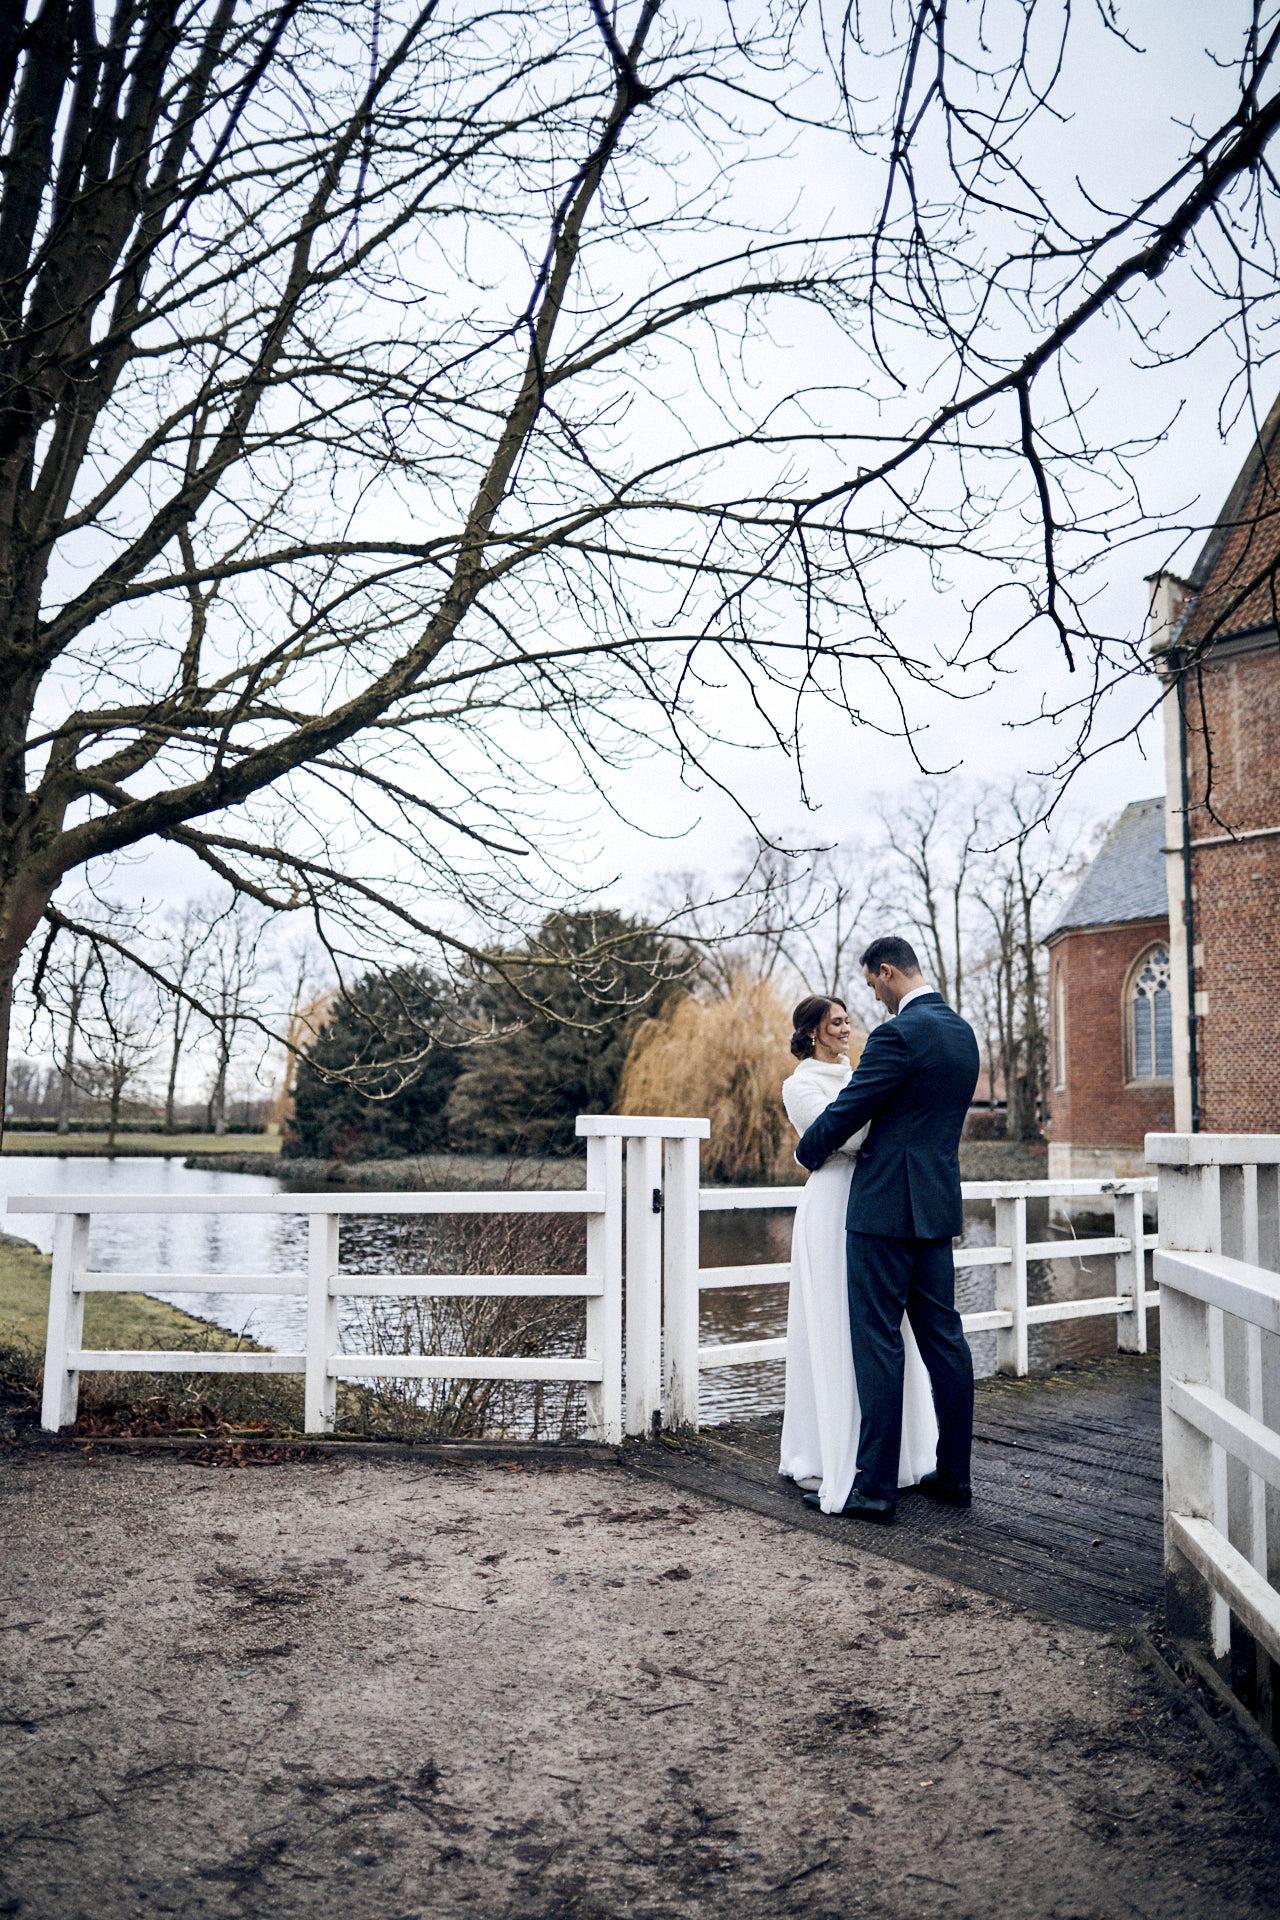 2019-12-20 Laura & Robin - Alena and Daniel Weddings 0509